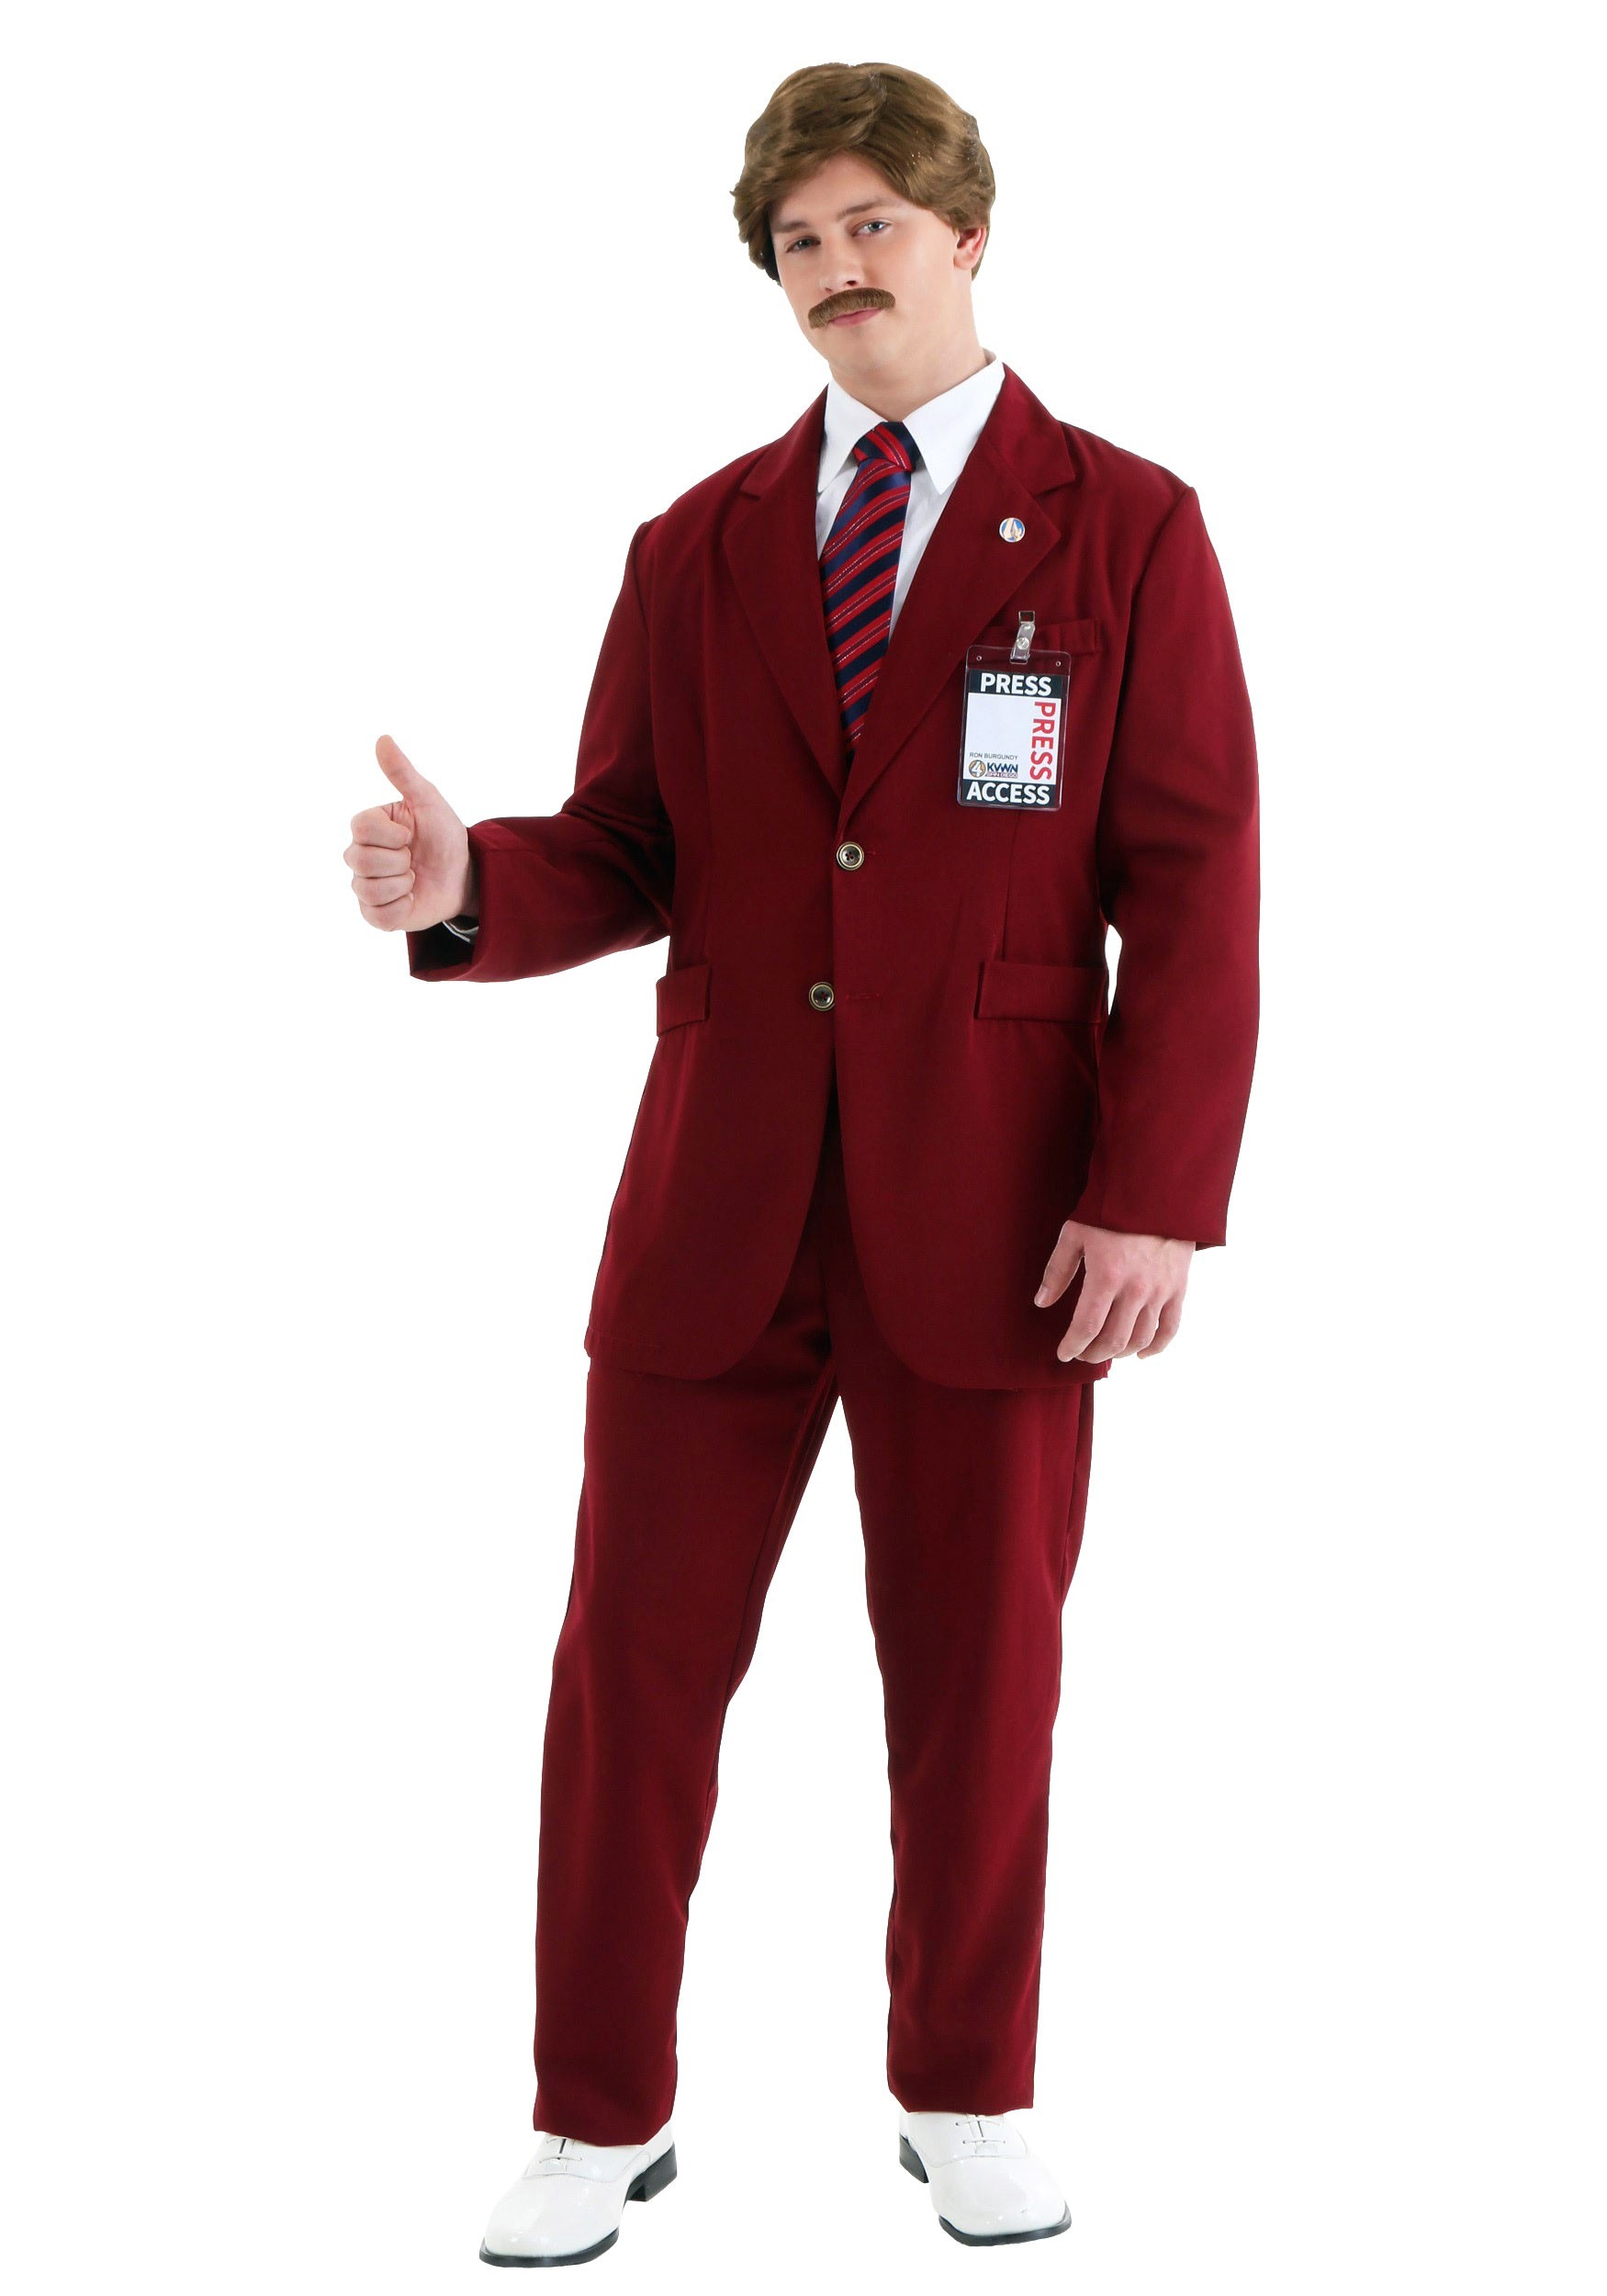 Deluxe Ron Burgundy Costume Suit